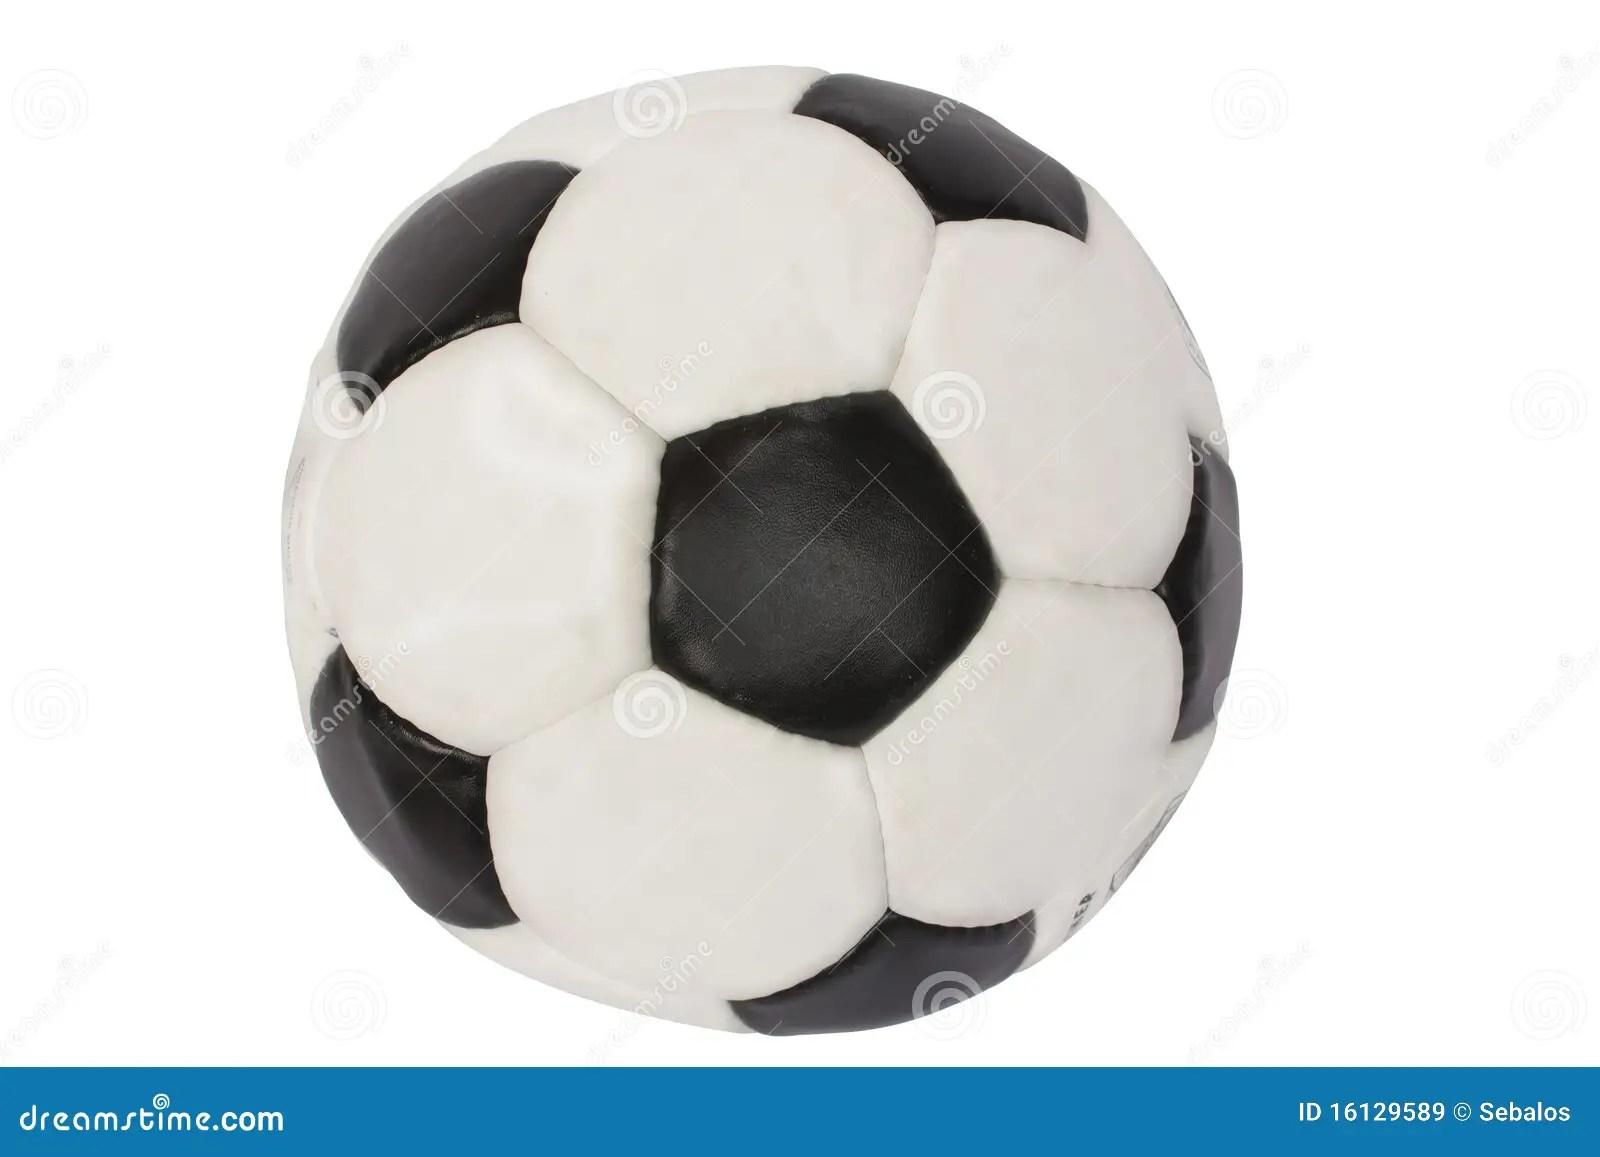 Soccer Ball Stock Image Image Of European Pentagon